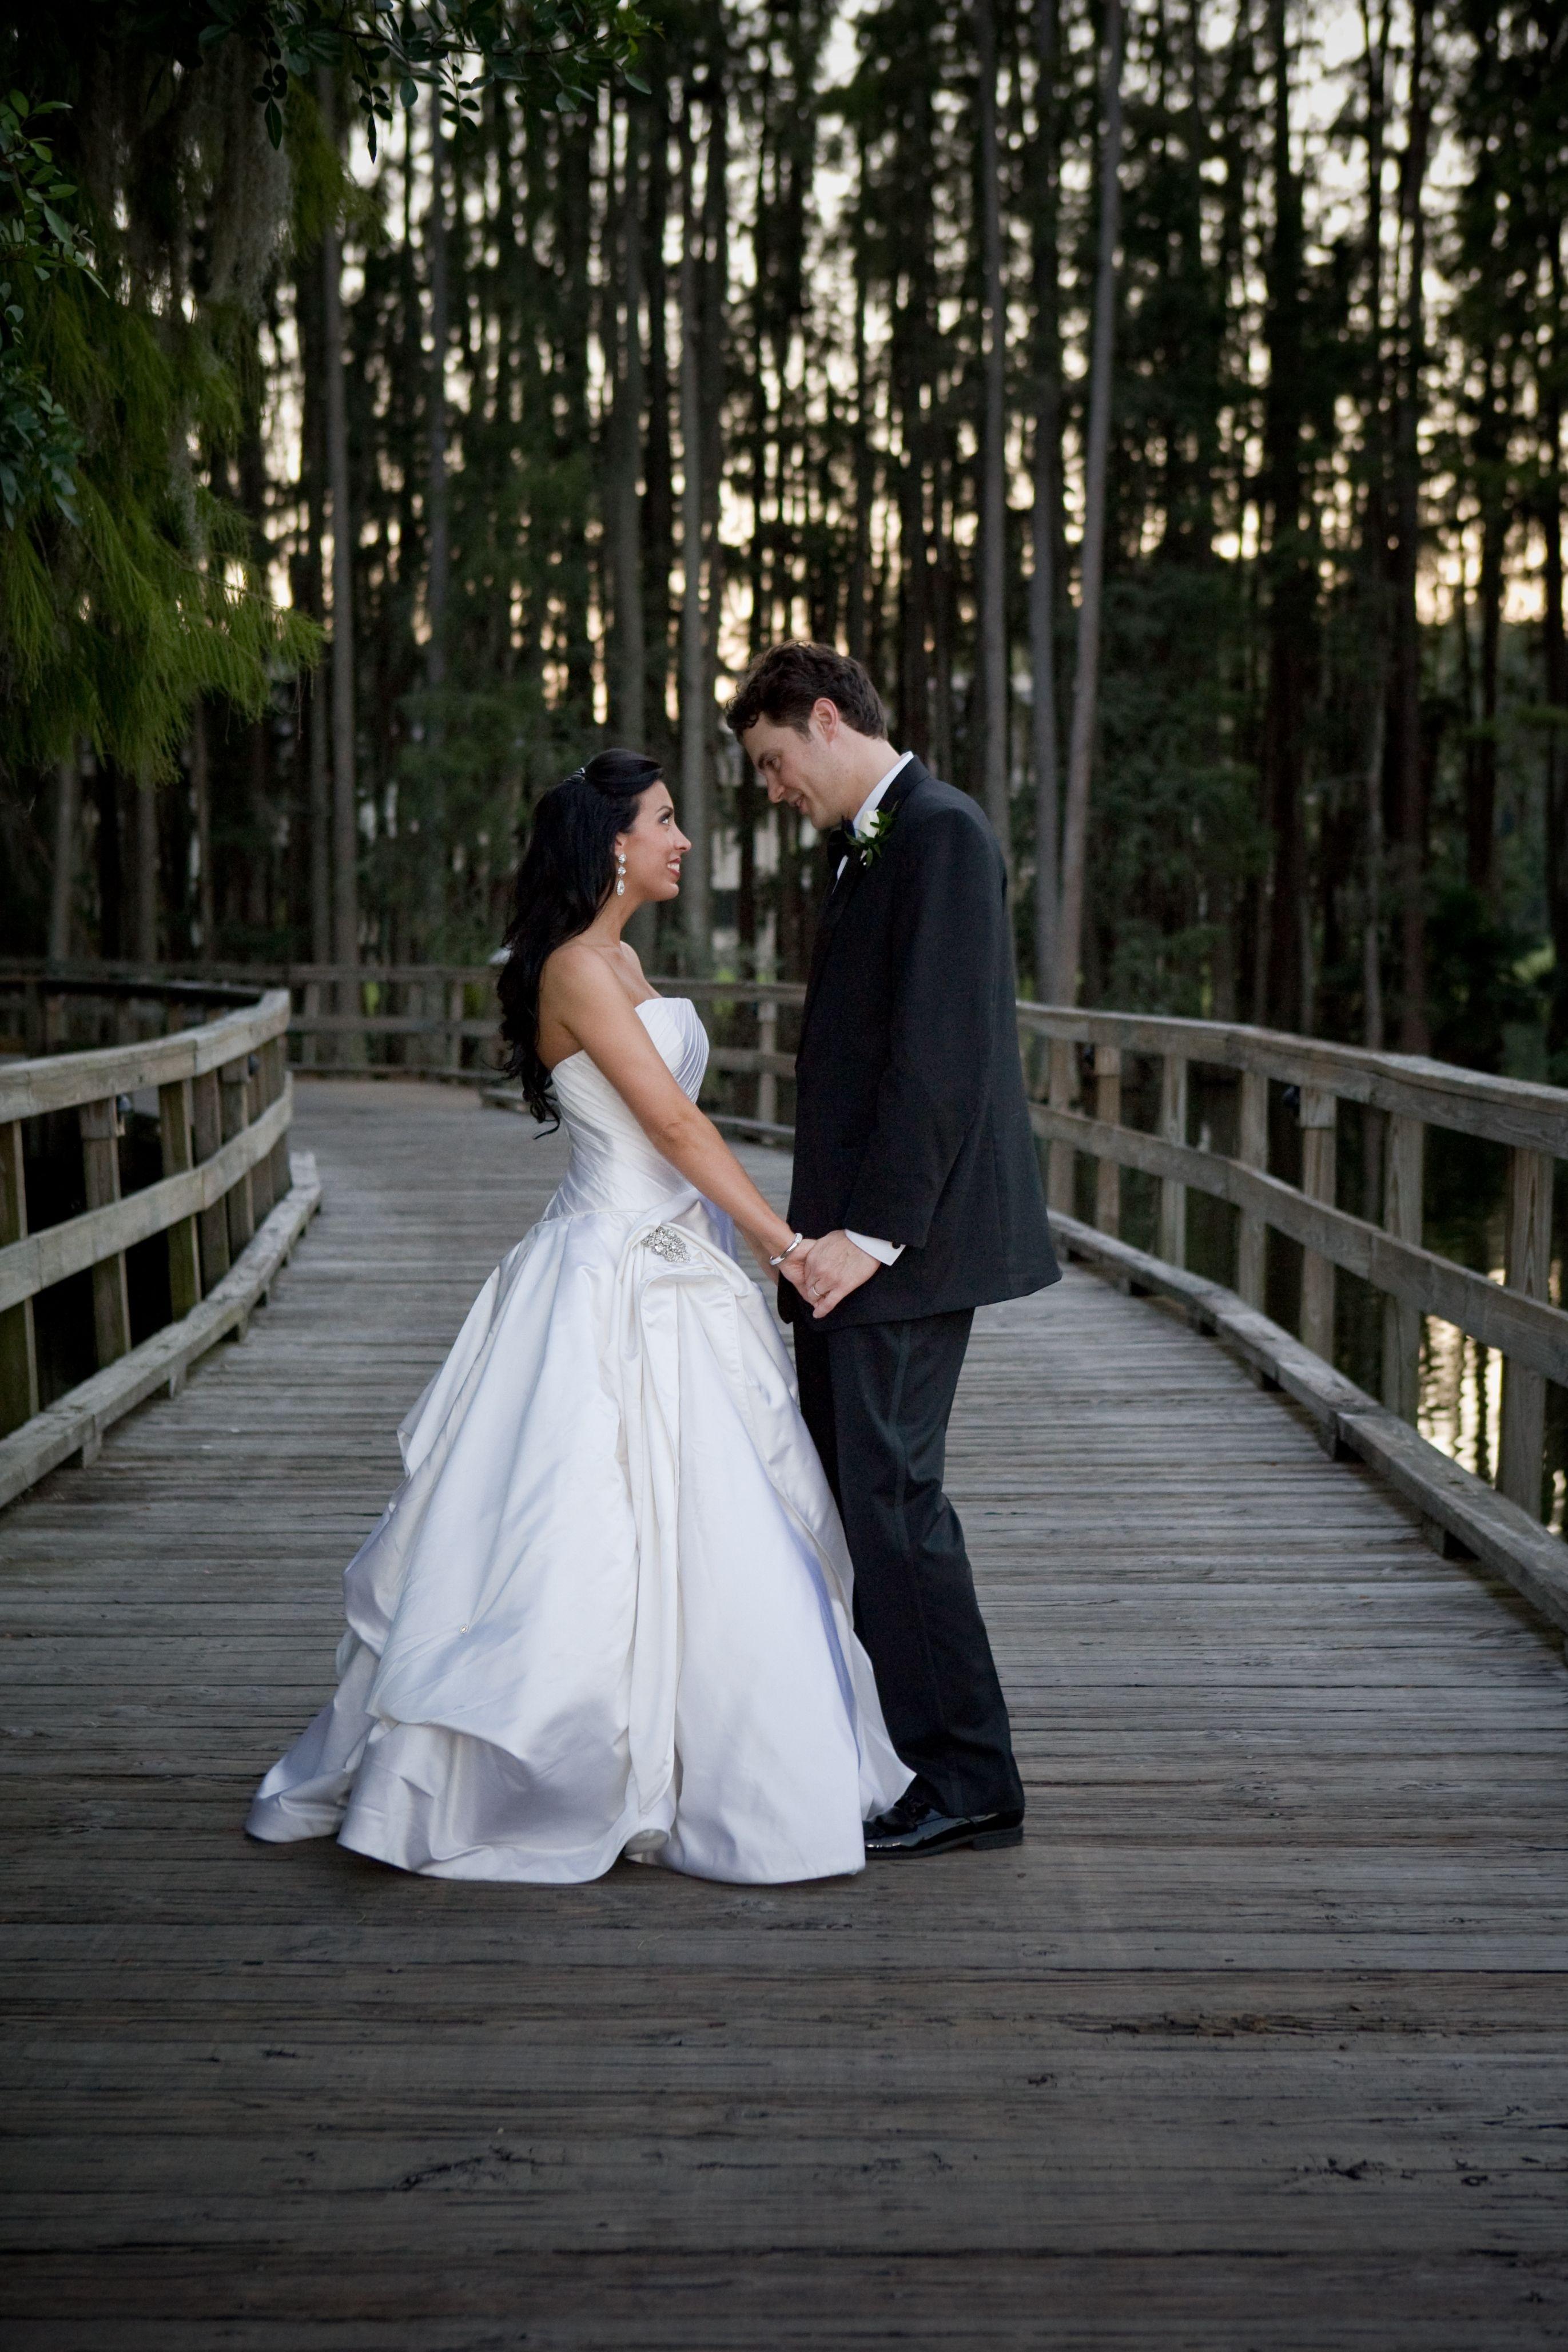 The woods, wildlife and lush greenery of Saddlebrook Resort exudes natural elegance for your wedding